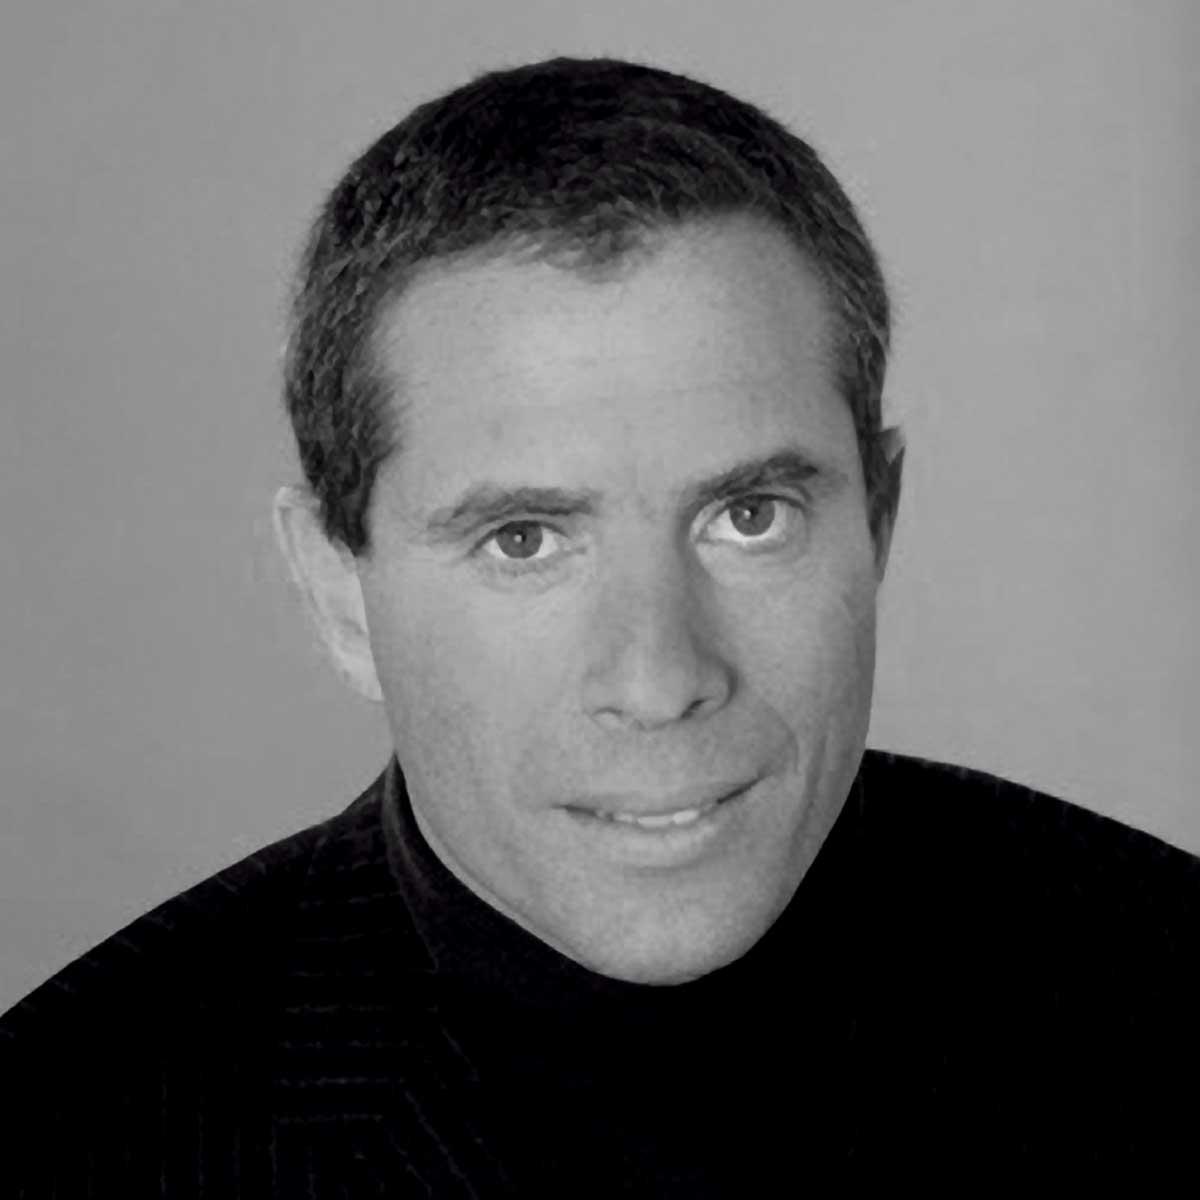 Jonathan Leitersdorf